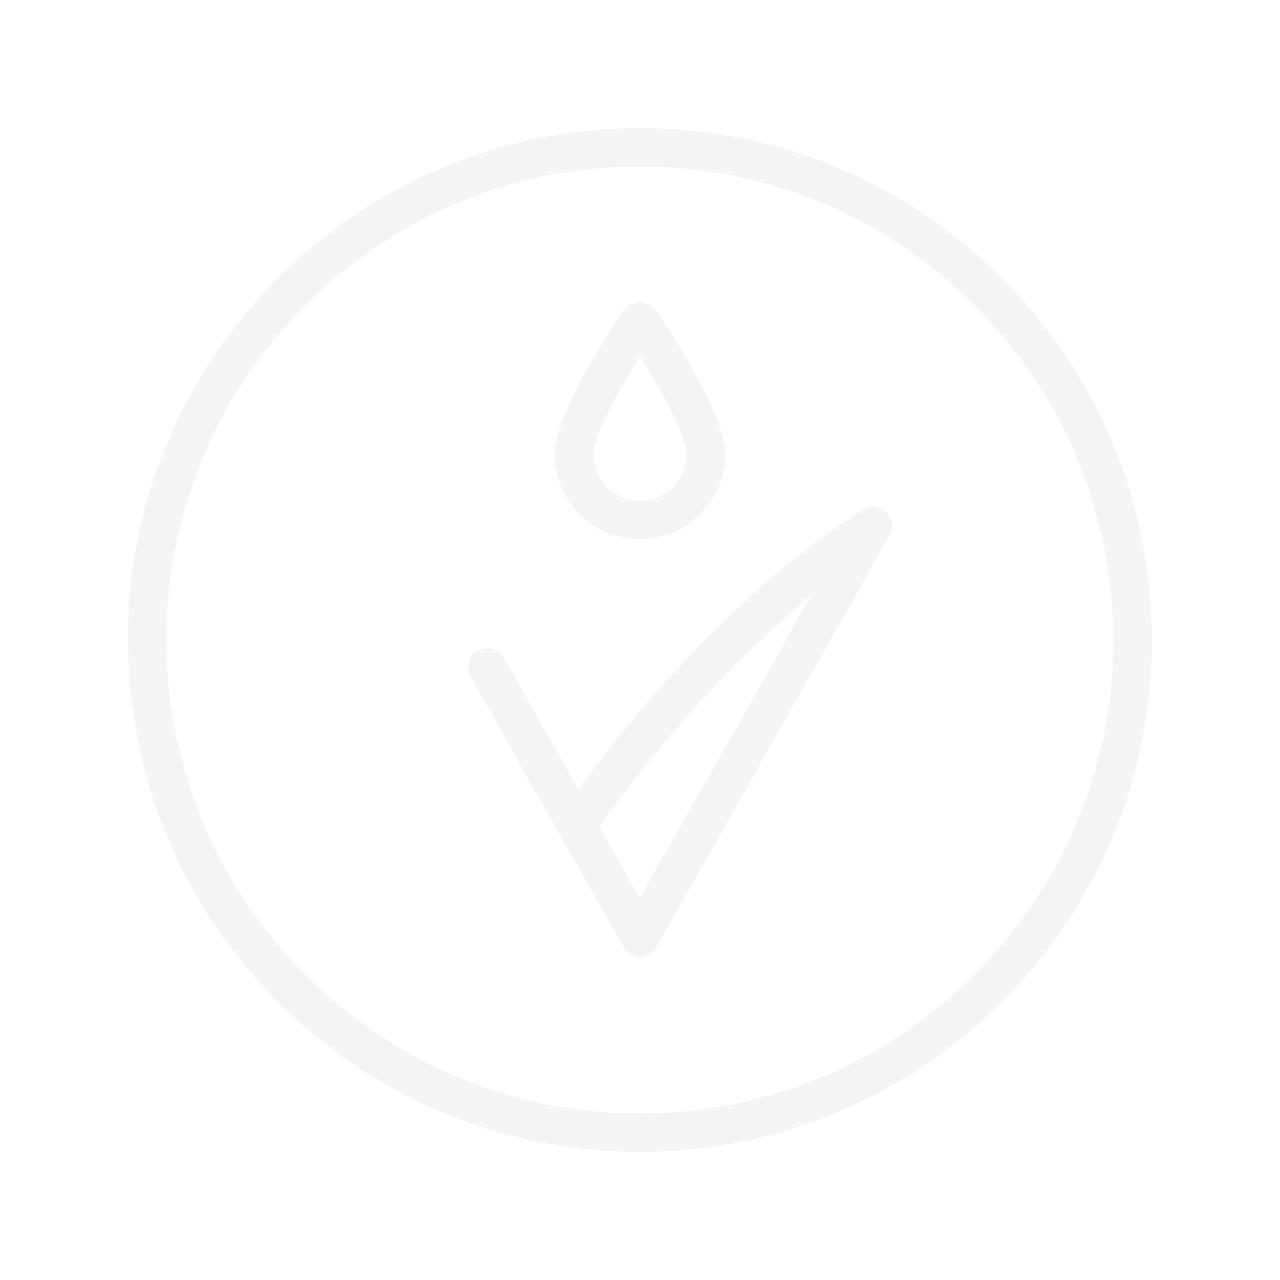 DIOR Diorskin Forever Extreme Control Matte Powder Makeup SPF20 No.030 Medium Beige матирующая компактная крем-пудра 9g